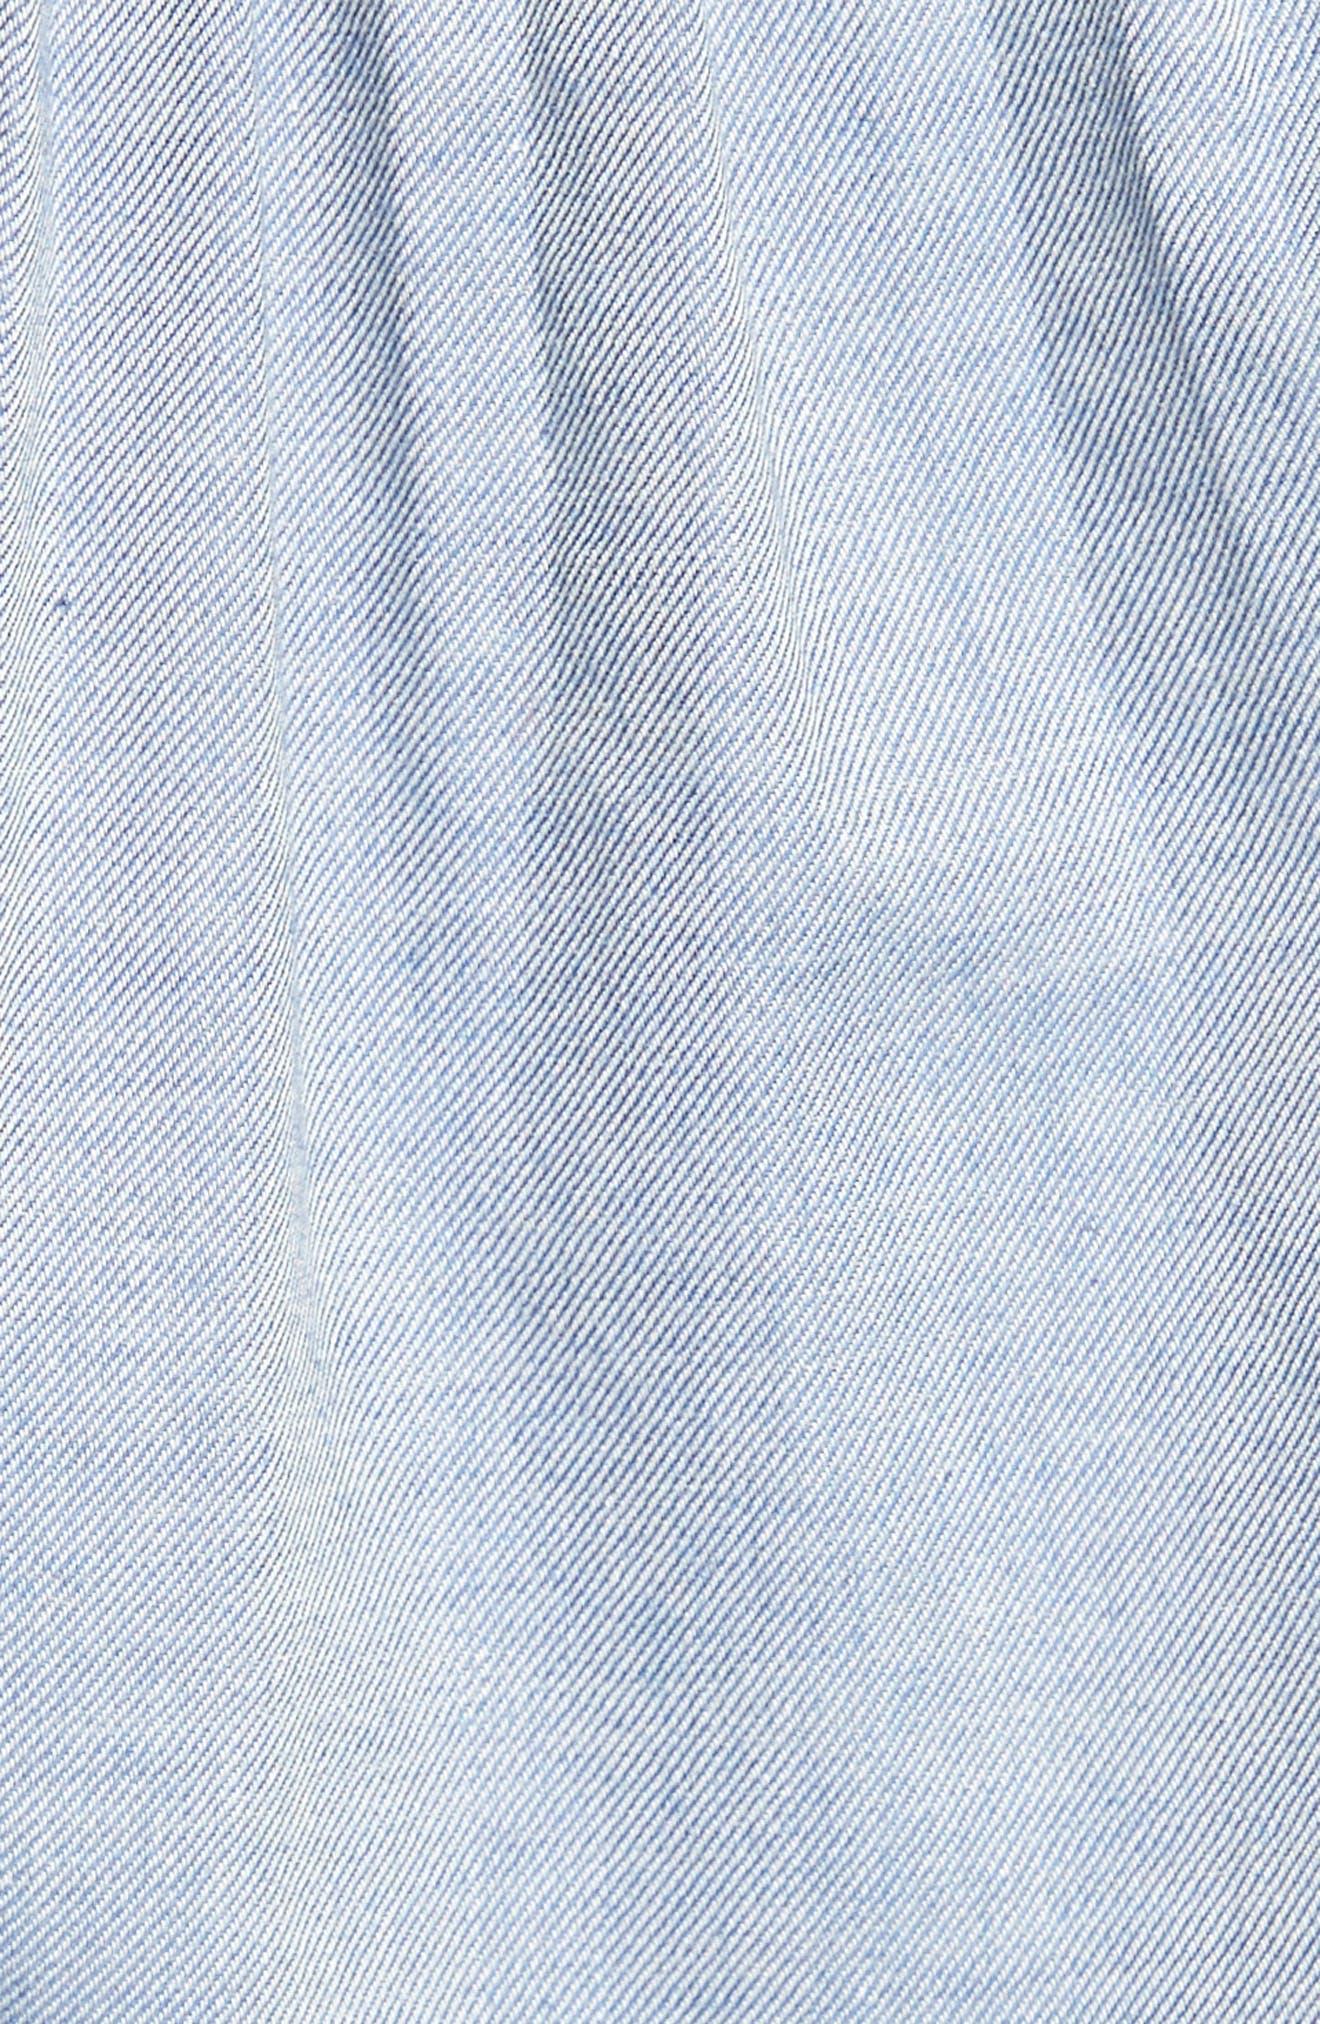 Edwardian Chambray Top,                             Alternate thumbnail 5, color,                             Blue